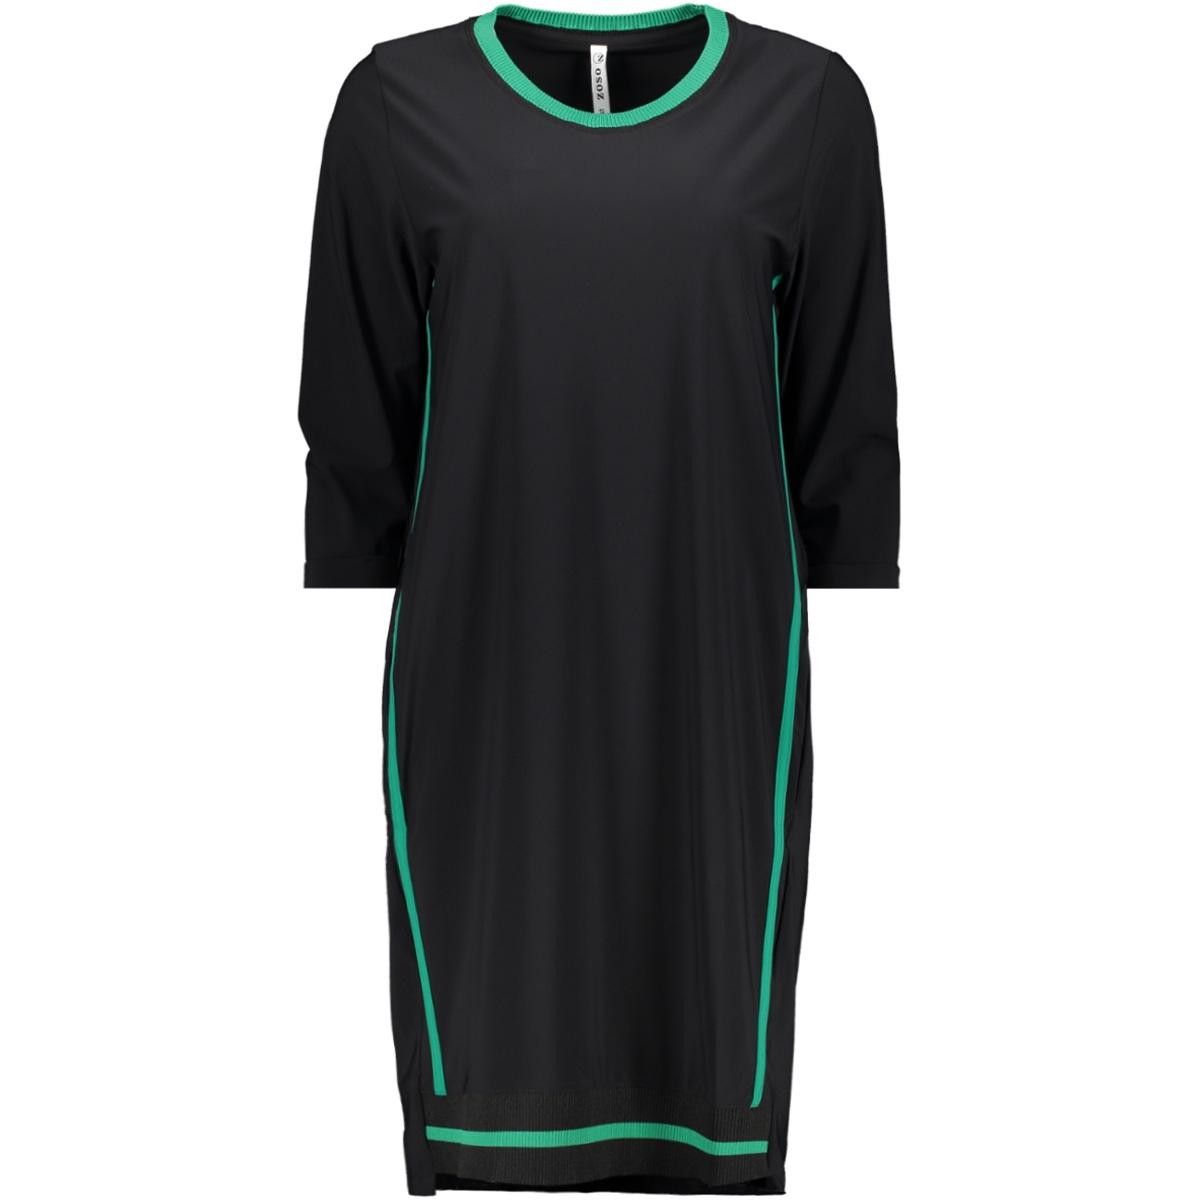 odette travel tunic zoso tuniek black/green